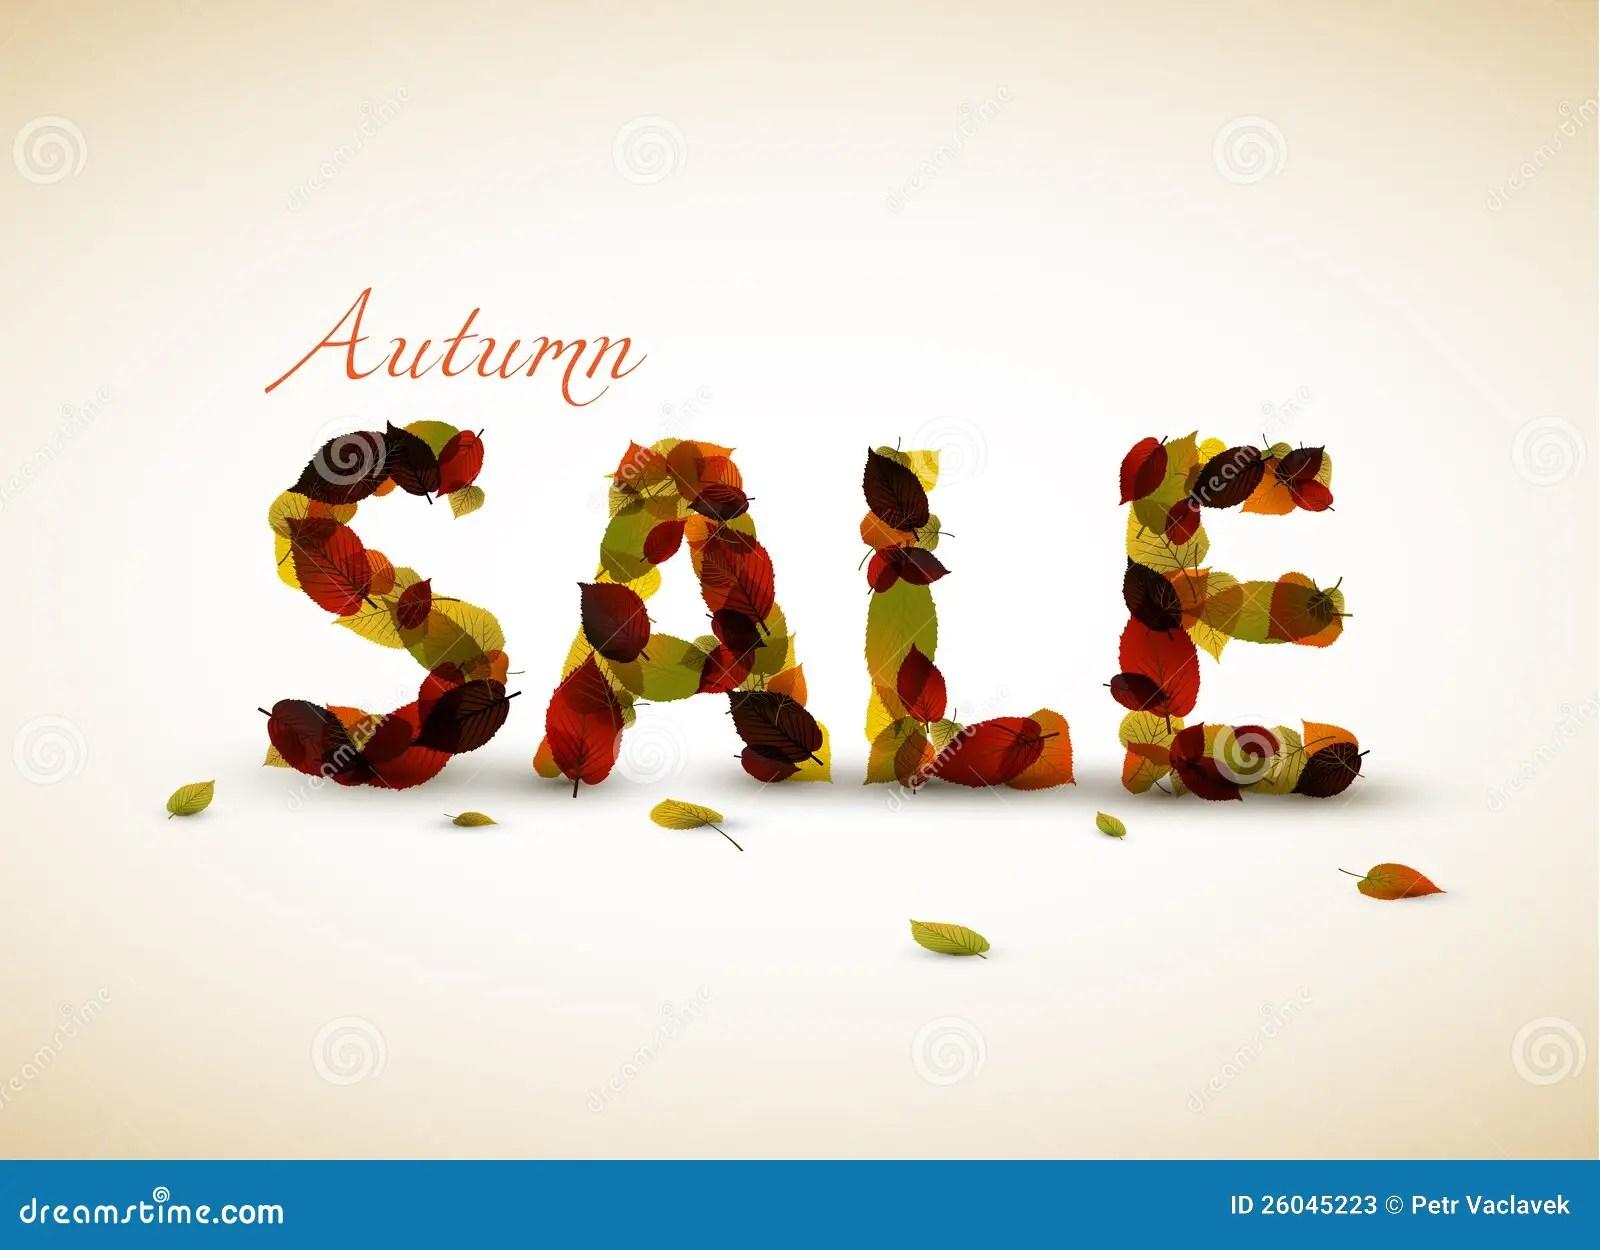 Vector Autumn Sale Poster Stock Photos Image 26045223